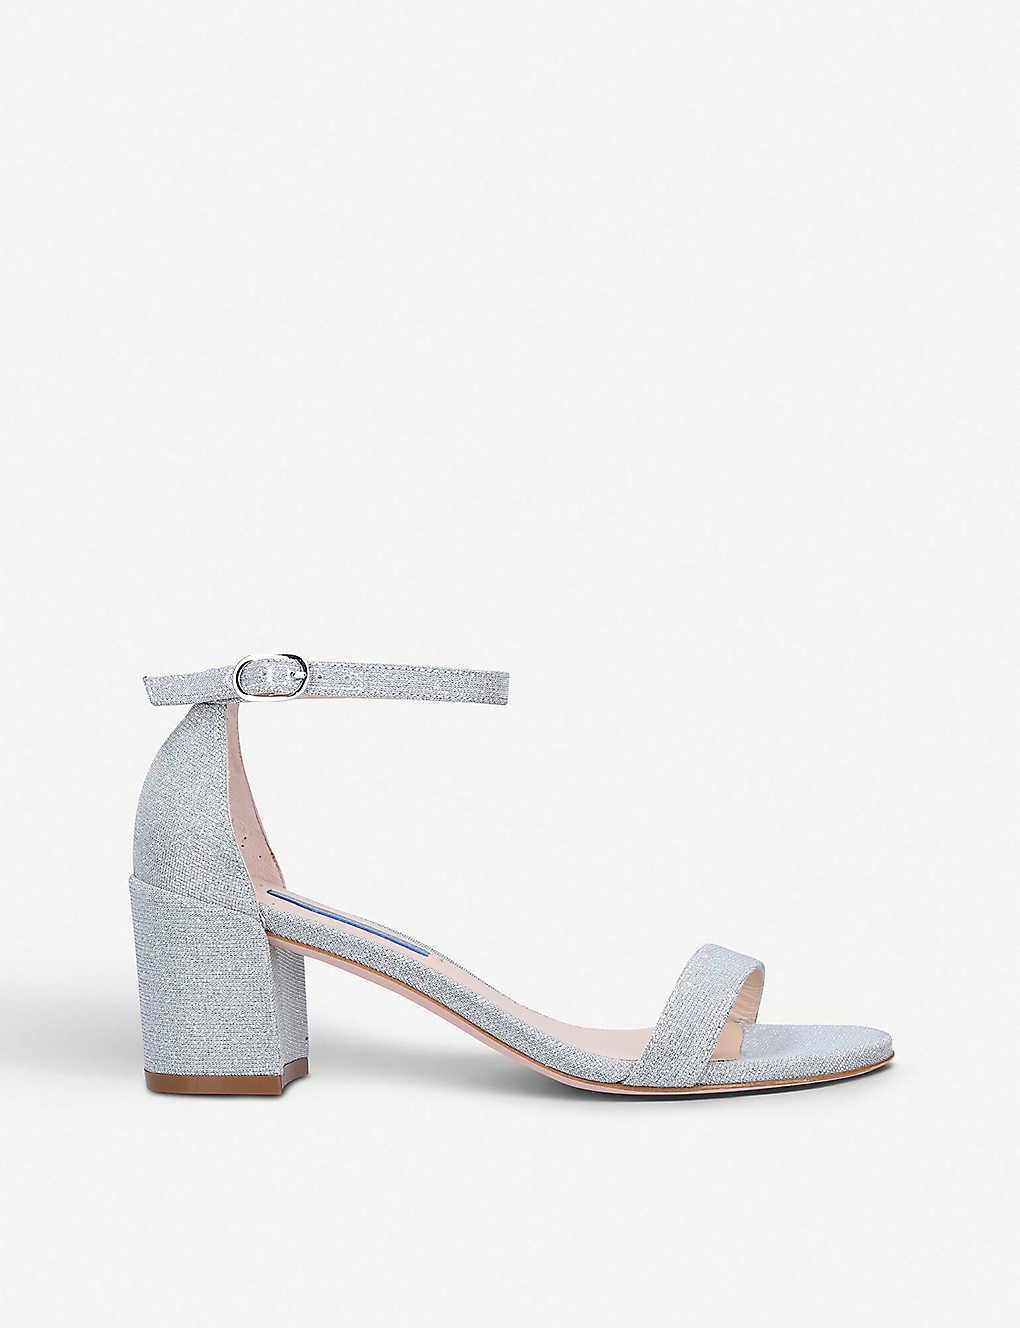 e33118986e6e STUART WEITZMAN - Simple glitter heeled sandals